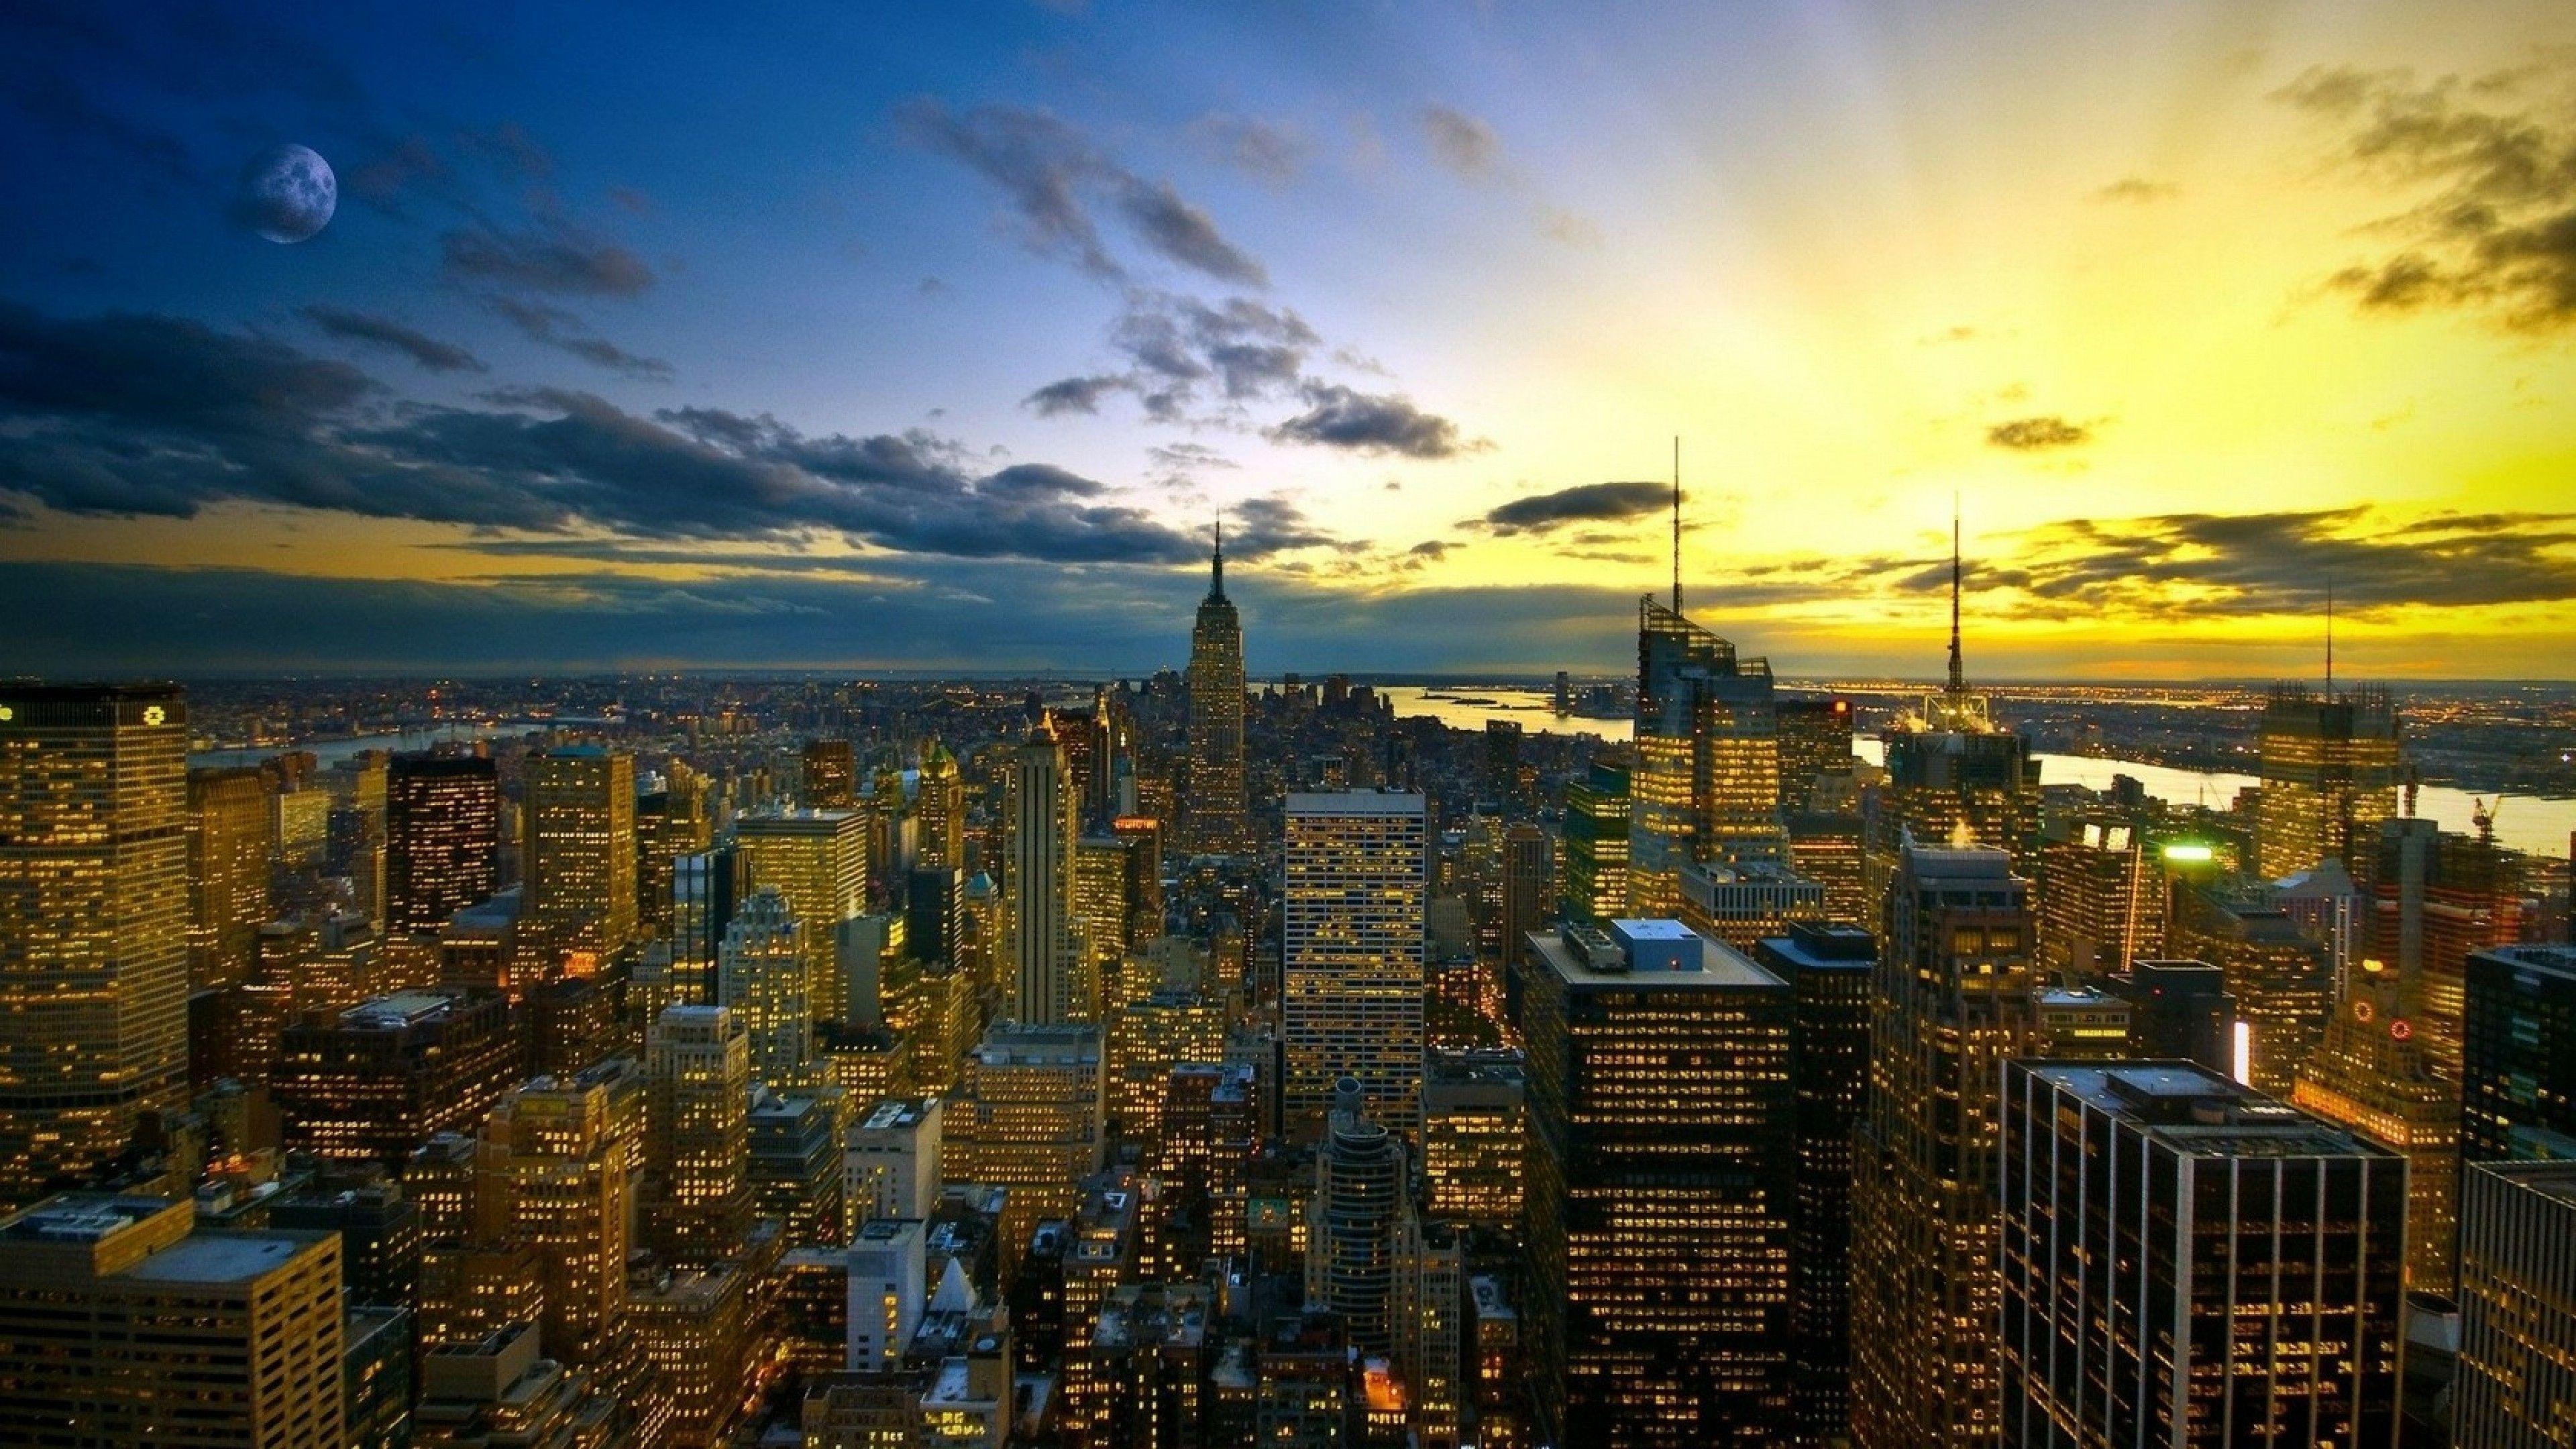 8k Ultra Hd City Wallpapers Top Free 8k Ultra Hd City Backgrounds Wallpaperaccess New York Wallpaper Sunset City New York